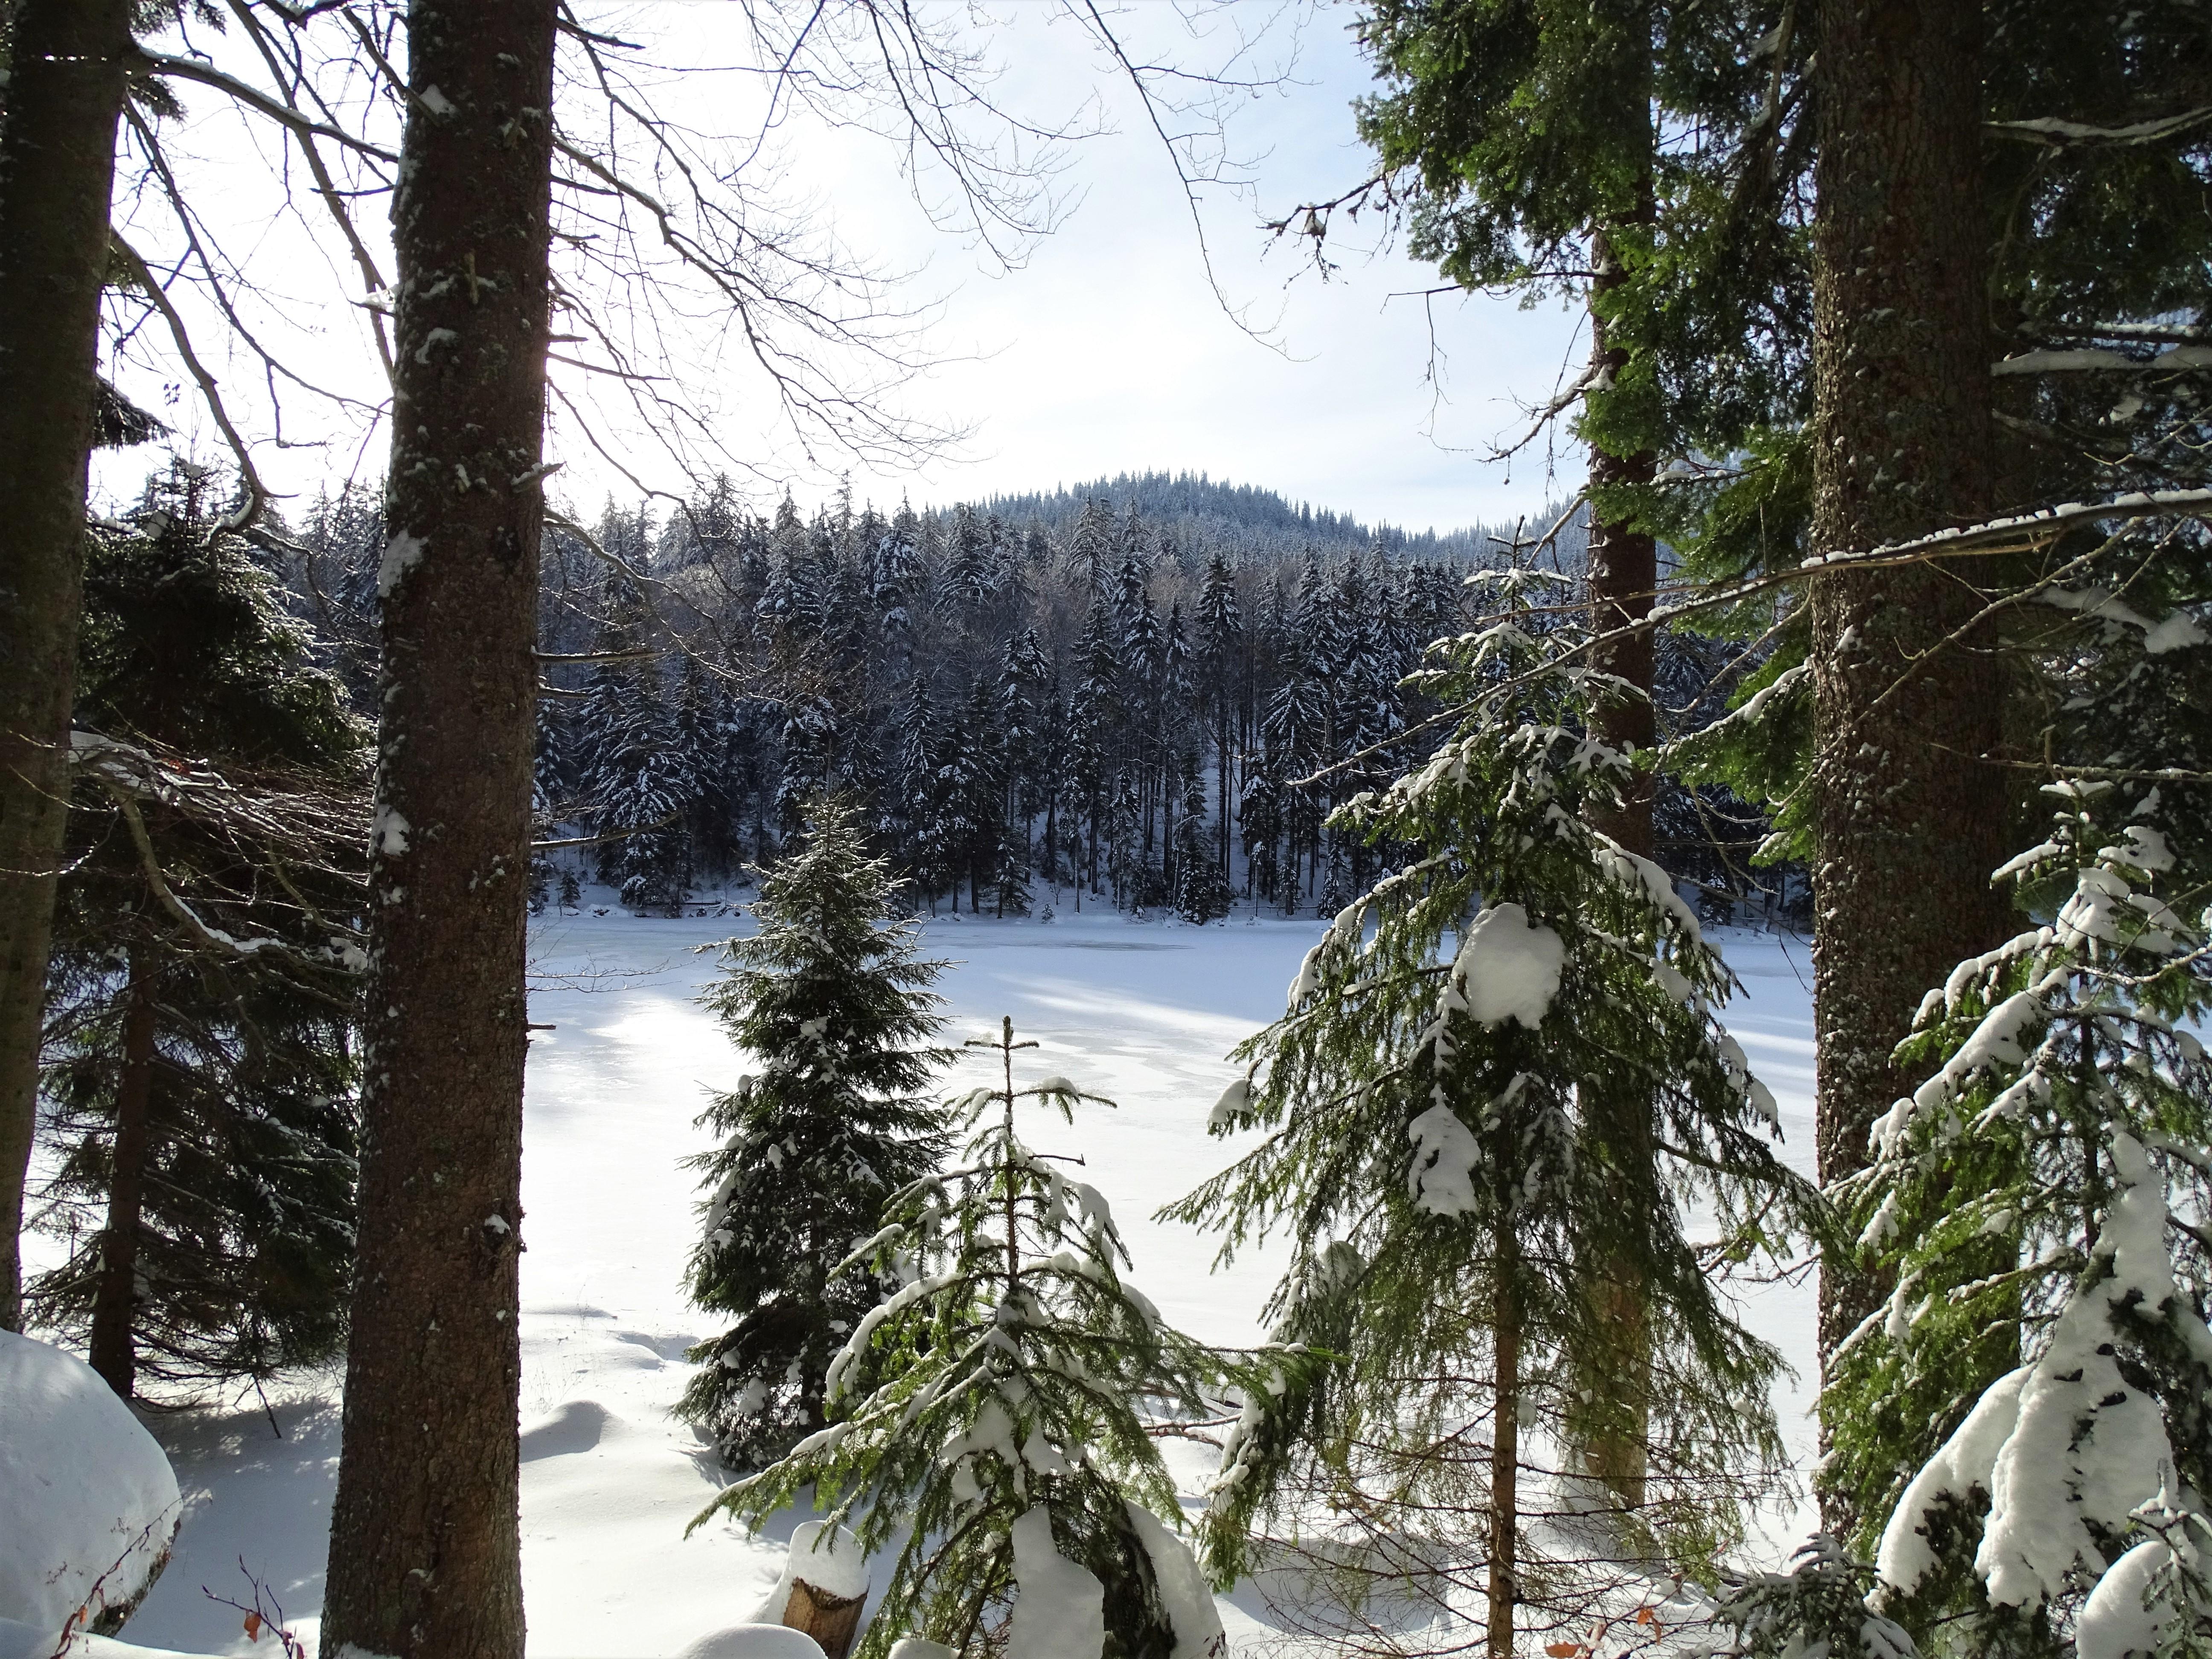 4-Am-Arbersee-im-Winter-Fotos-Nadia-Baumgart